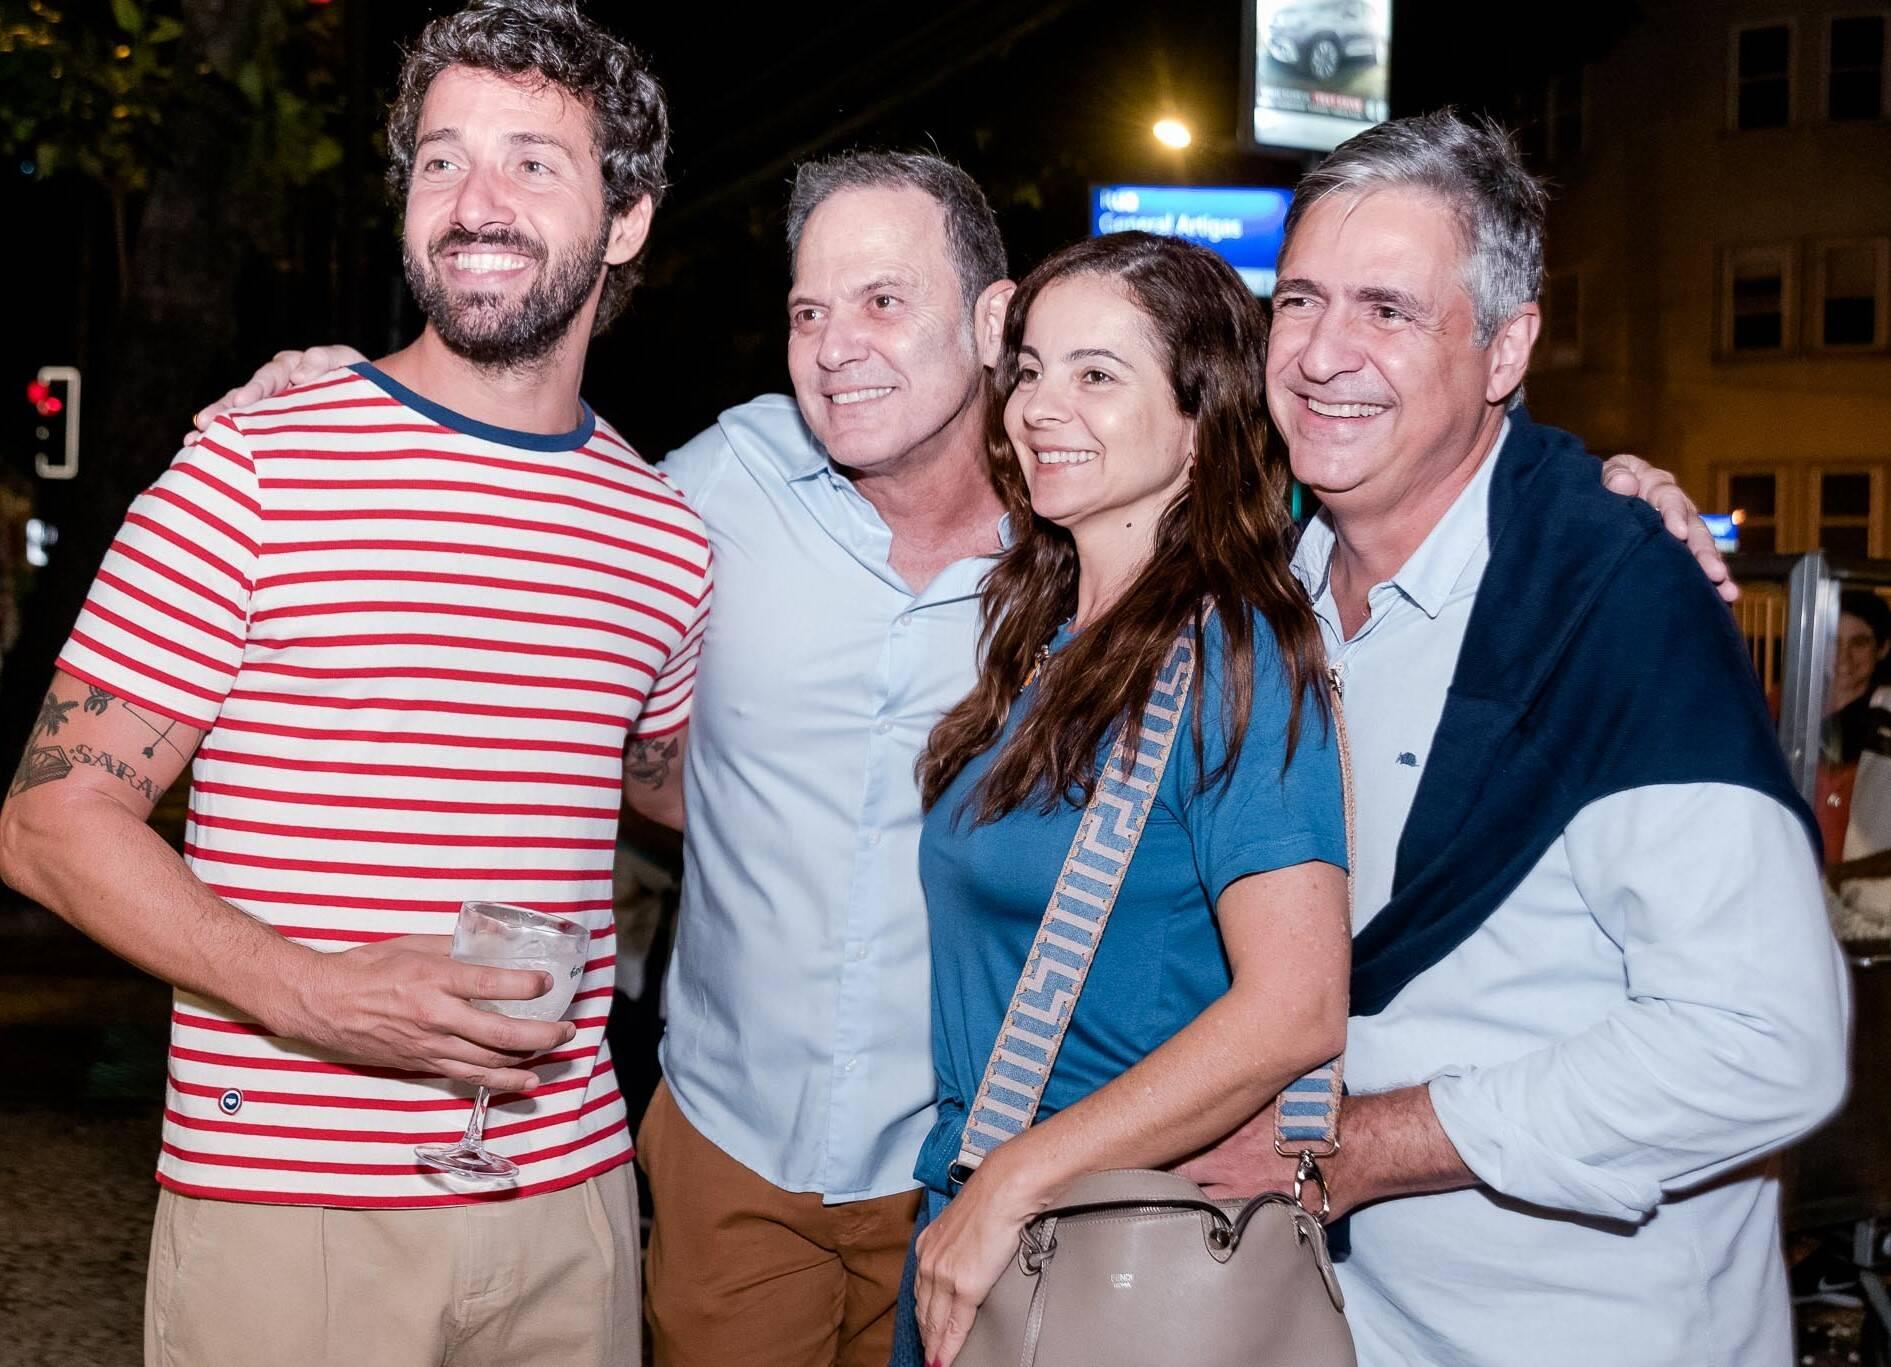 Hermés Galvão,  Aloizio de Abreu, Isabela Menezes e Toni Oliveira  /Foto: Renato Wrobel